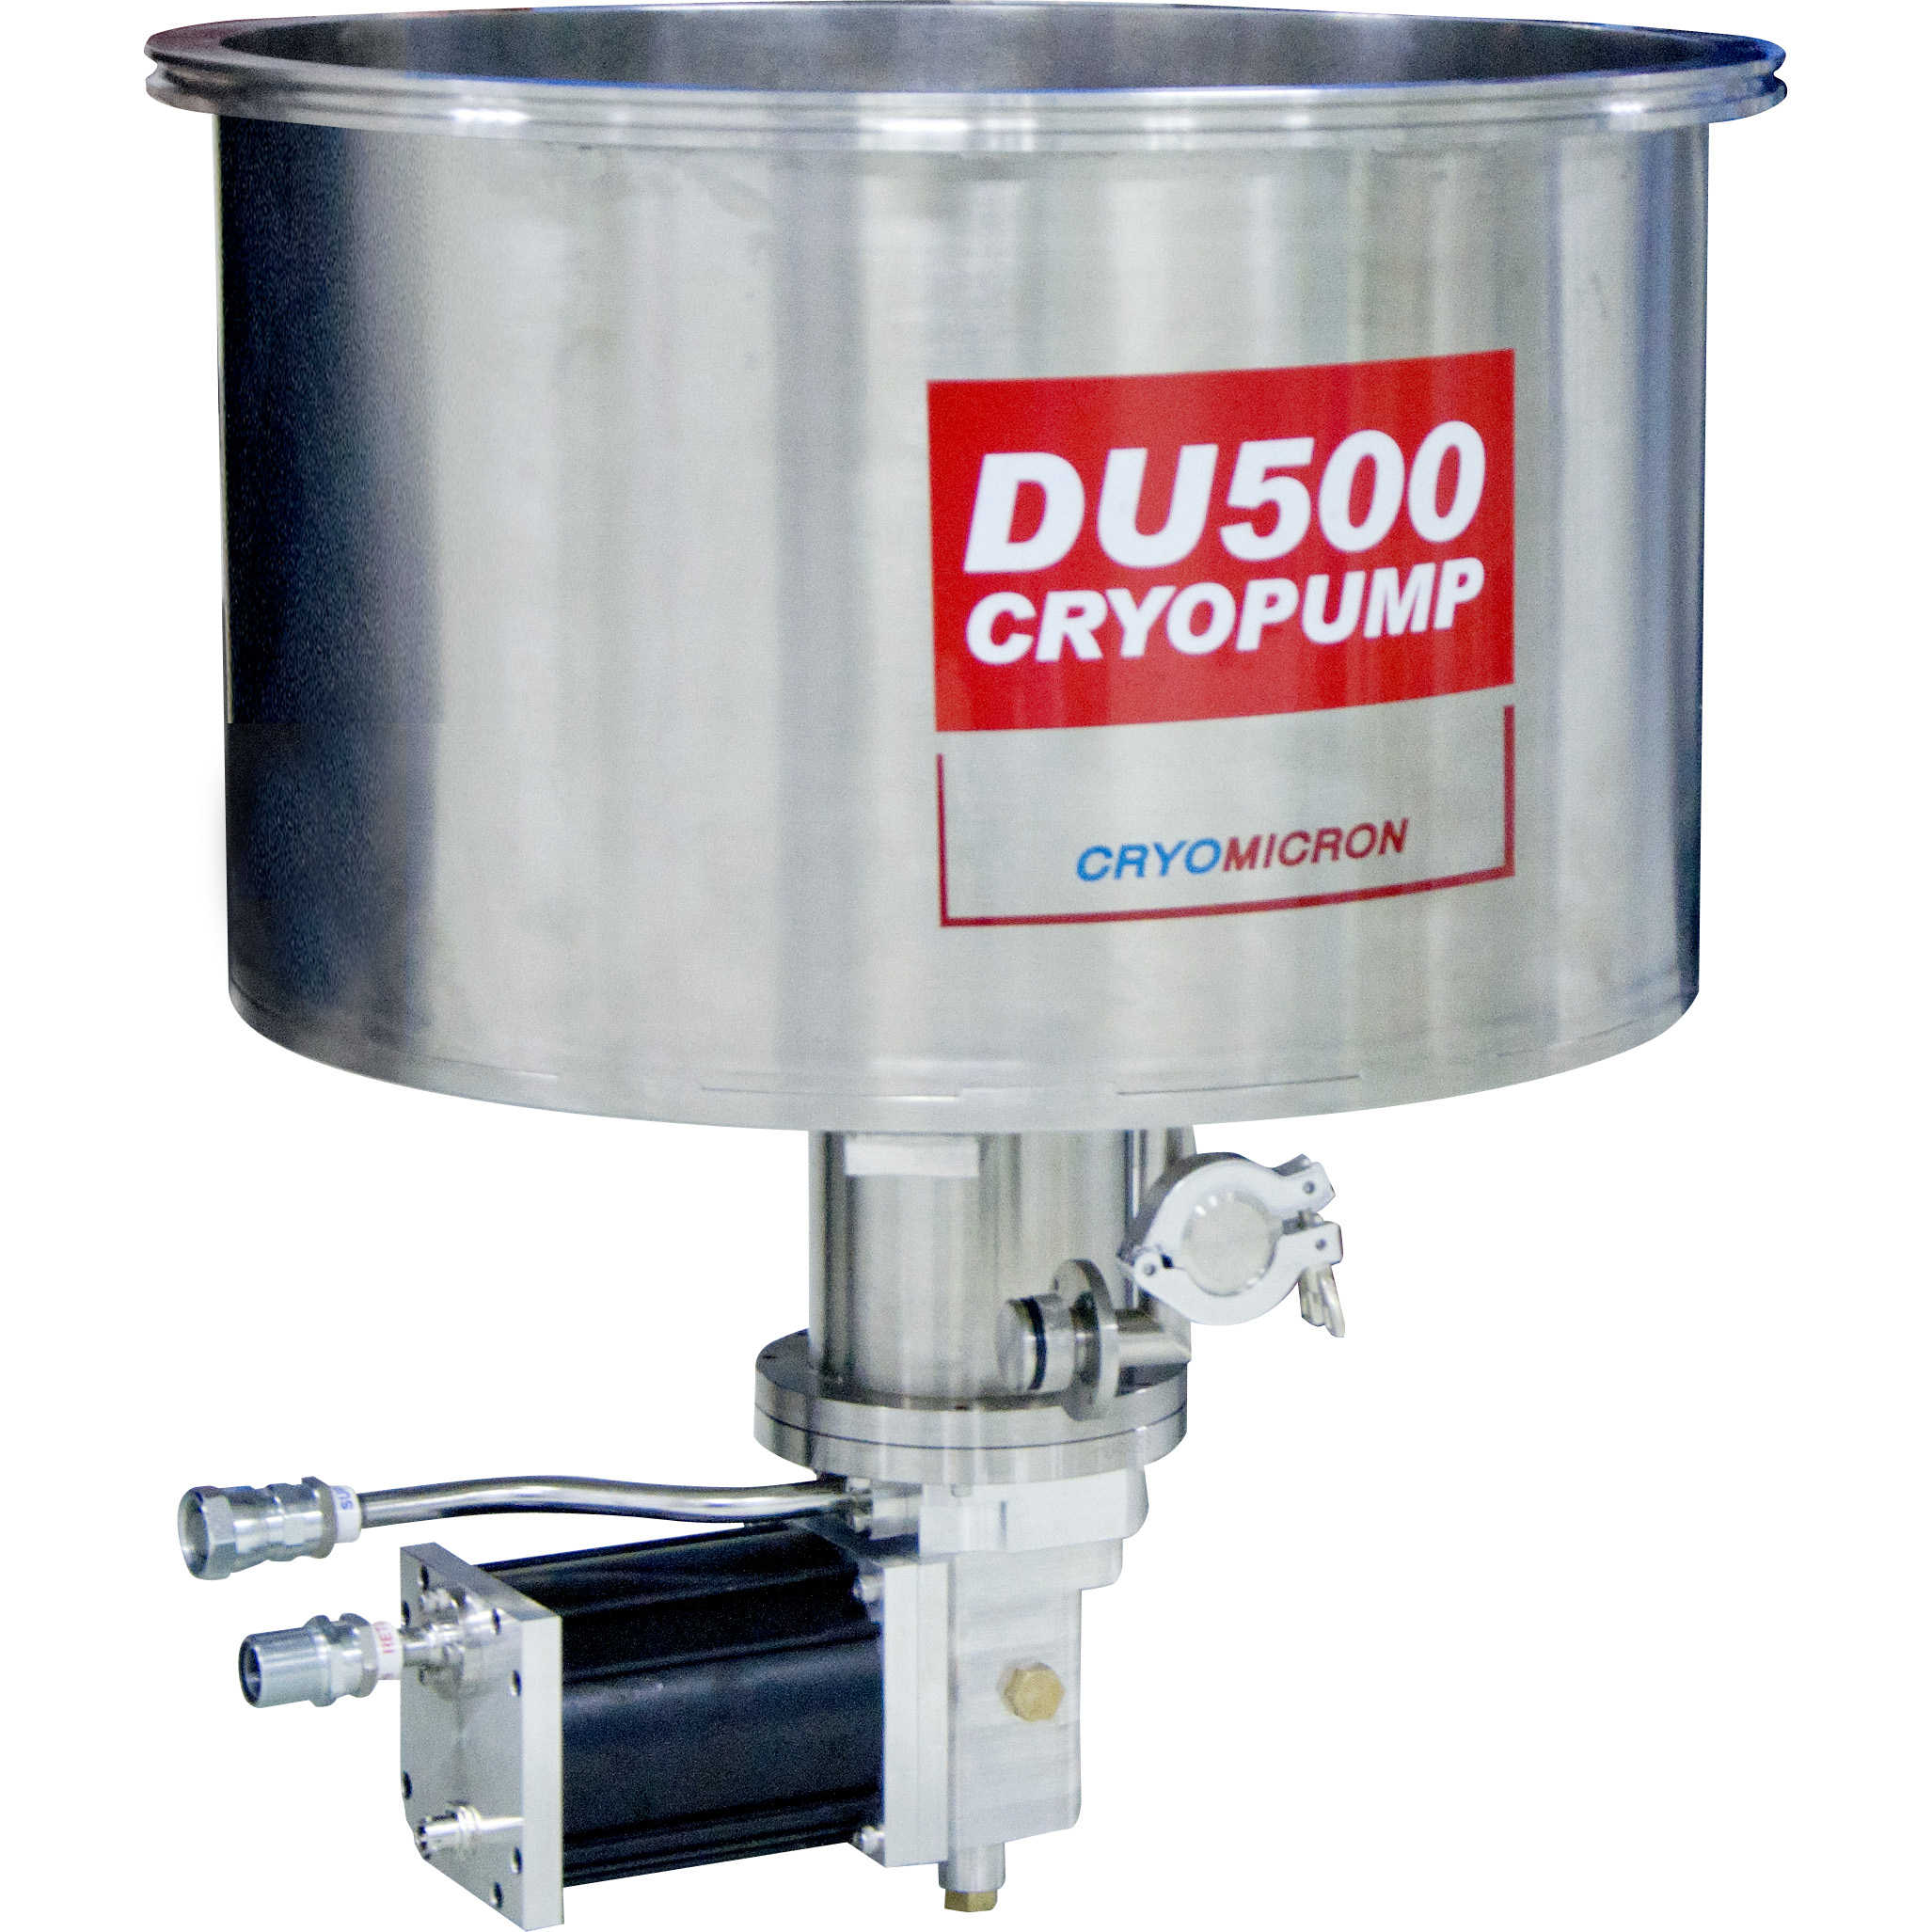 DU500